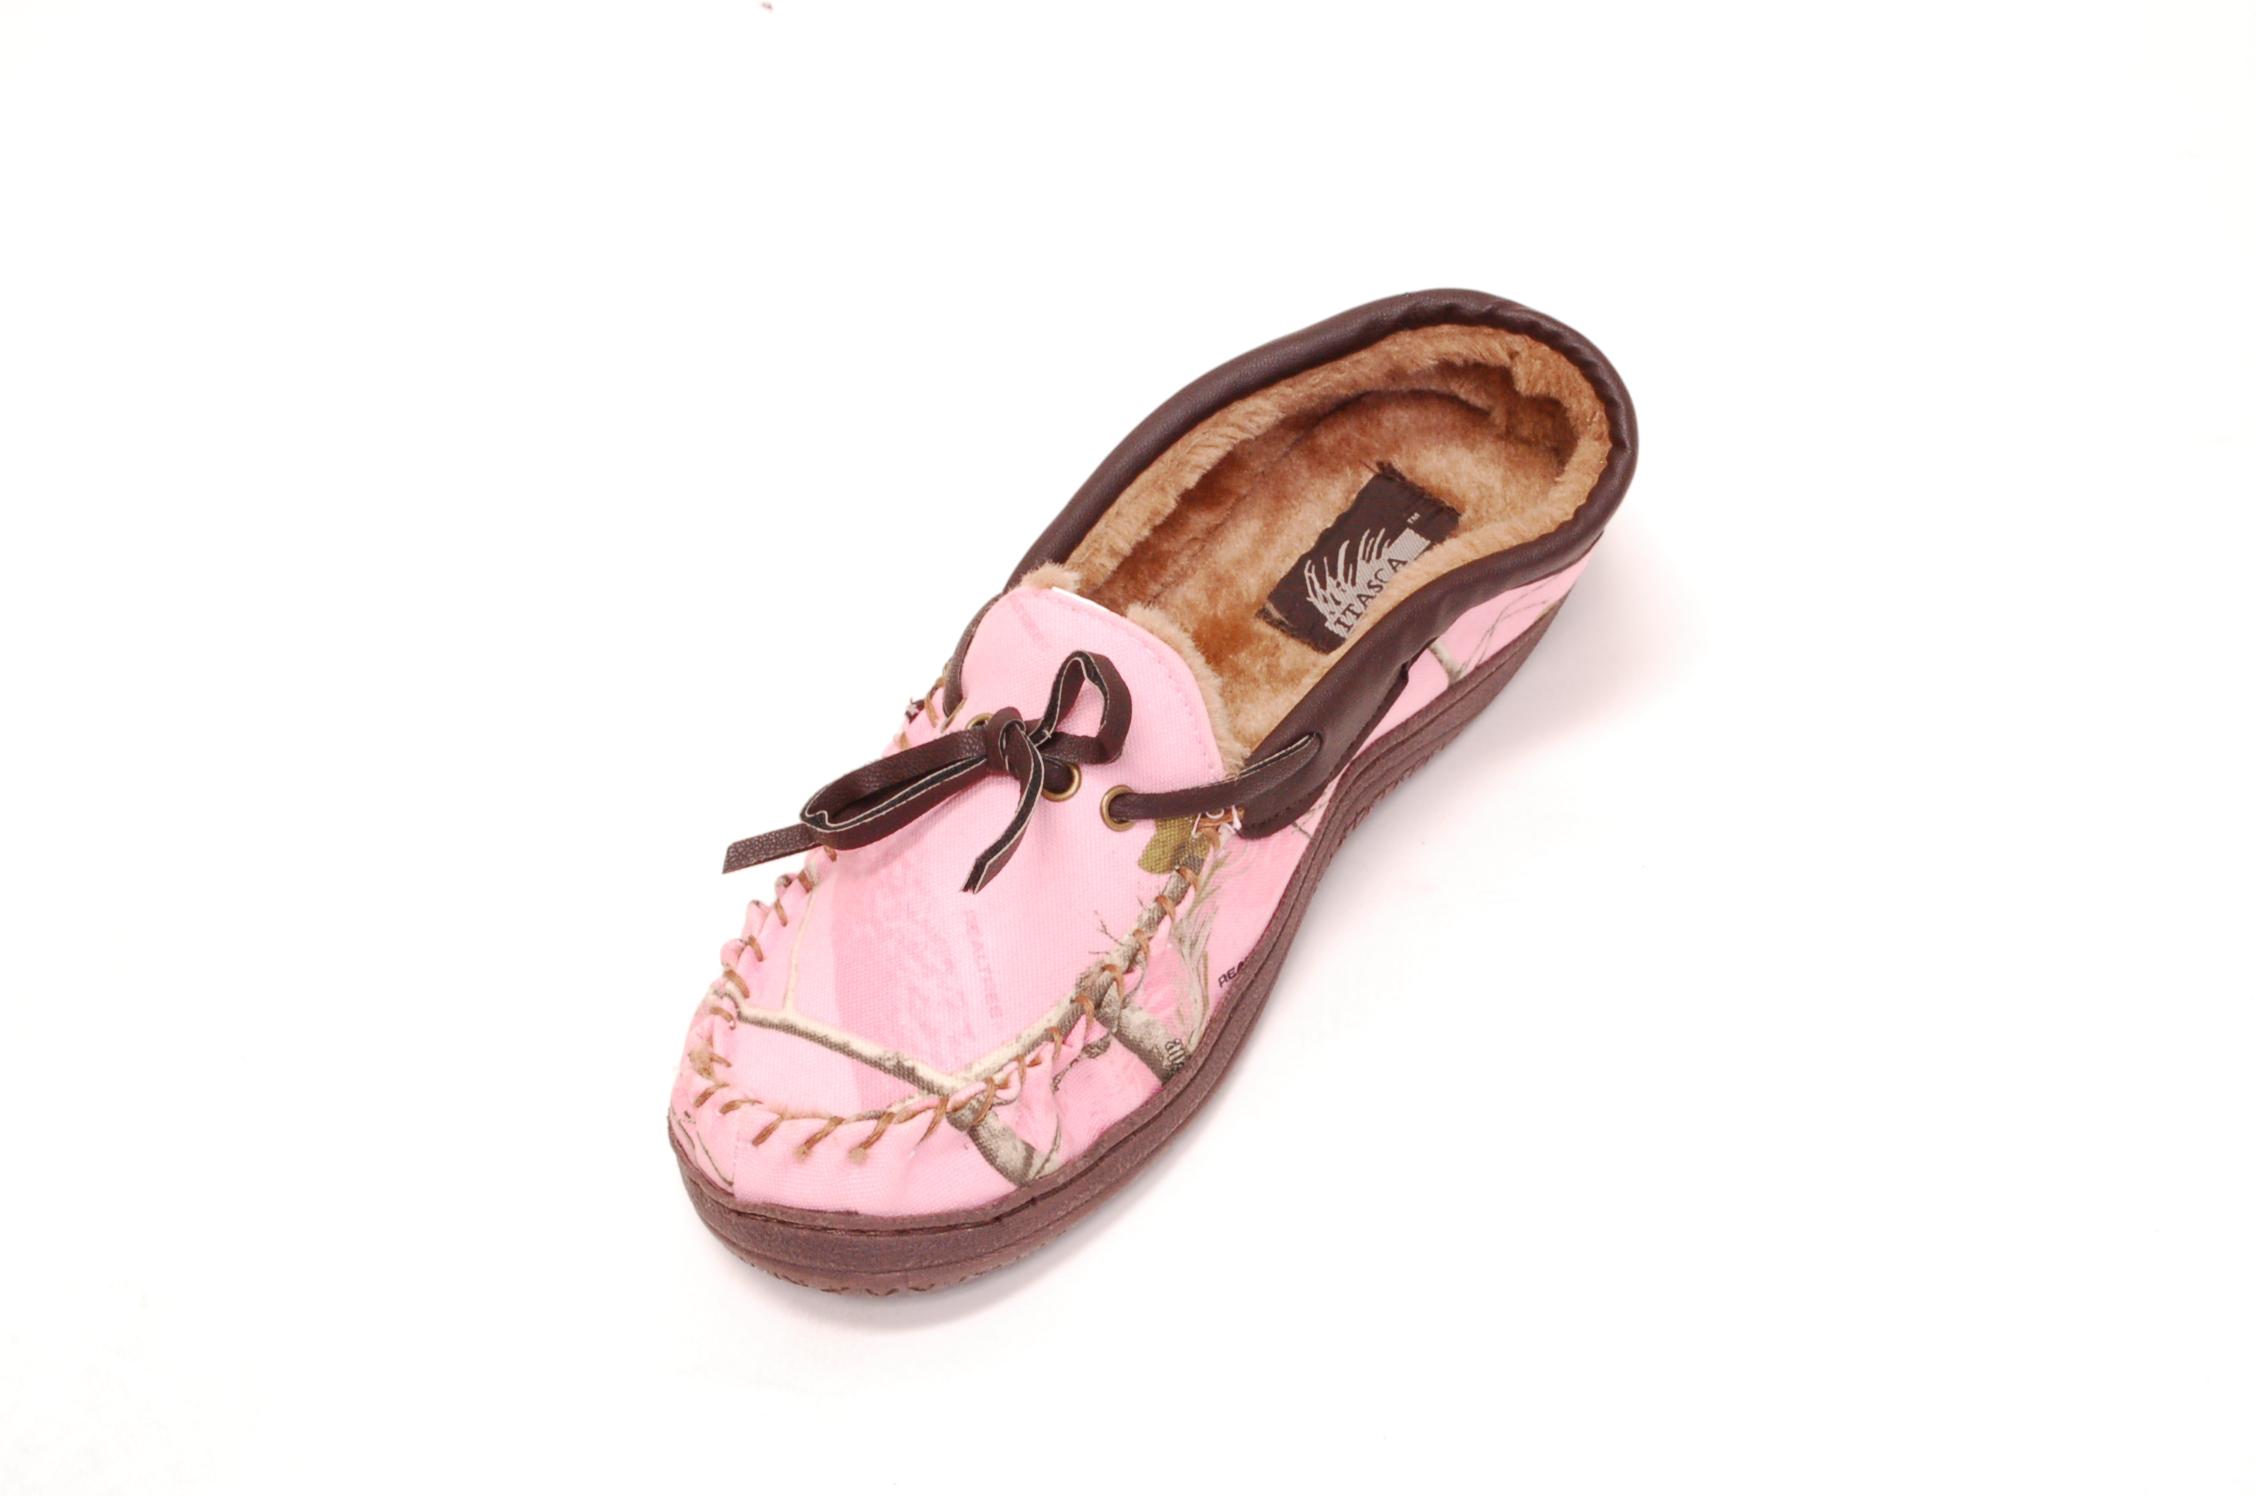 e98a5a9df940c Itasca Women's Realtree Slipper - Pink Camo - Size: 6 - Check Back ...